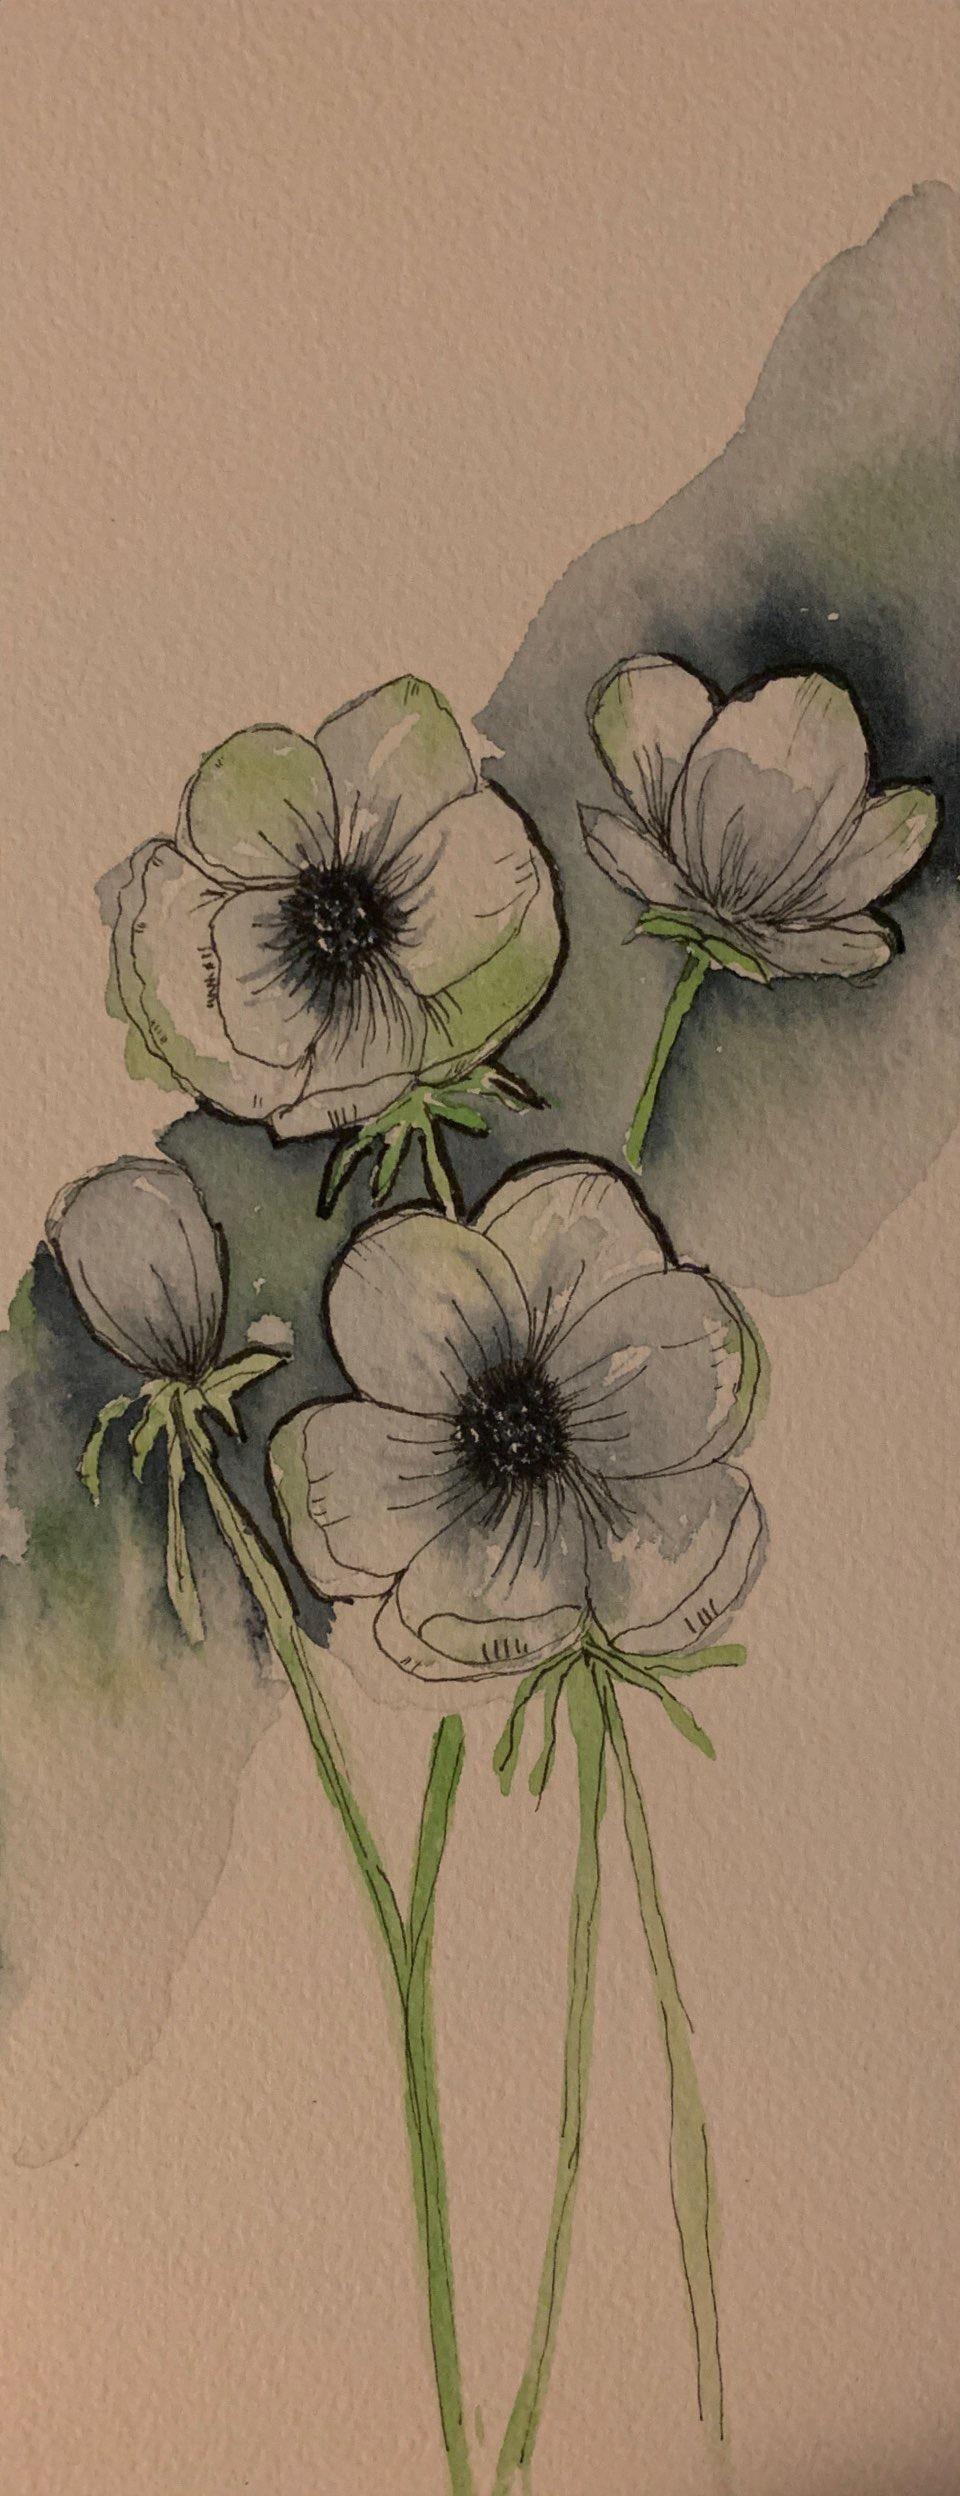 Anemones - Florals - image 2 - student project